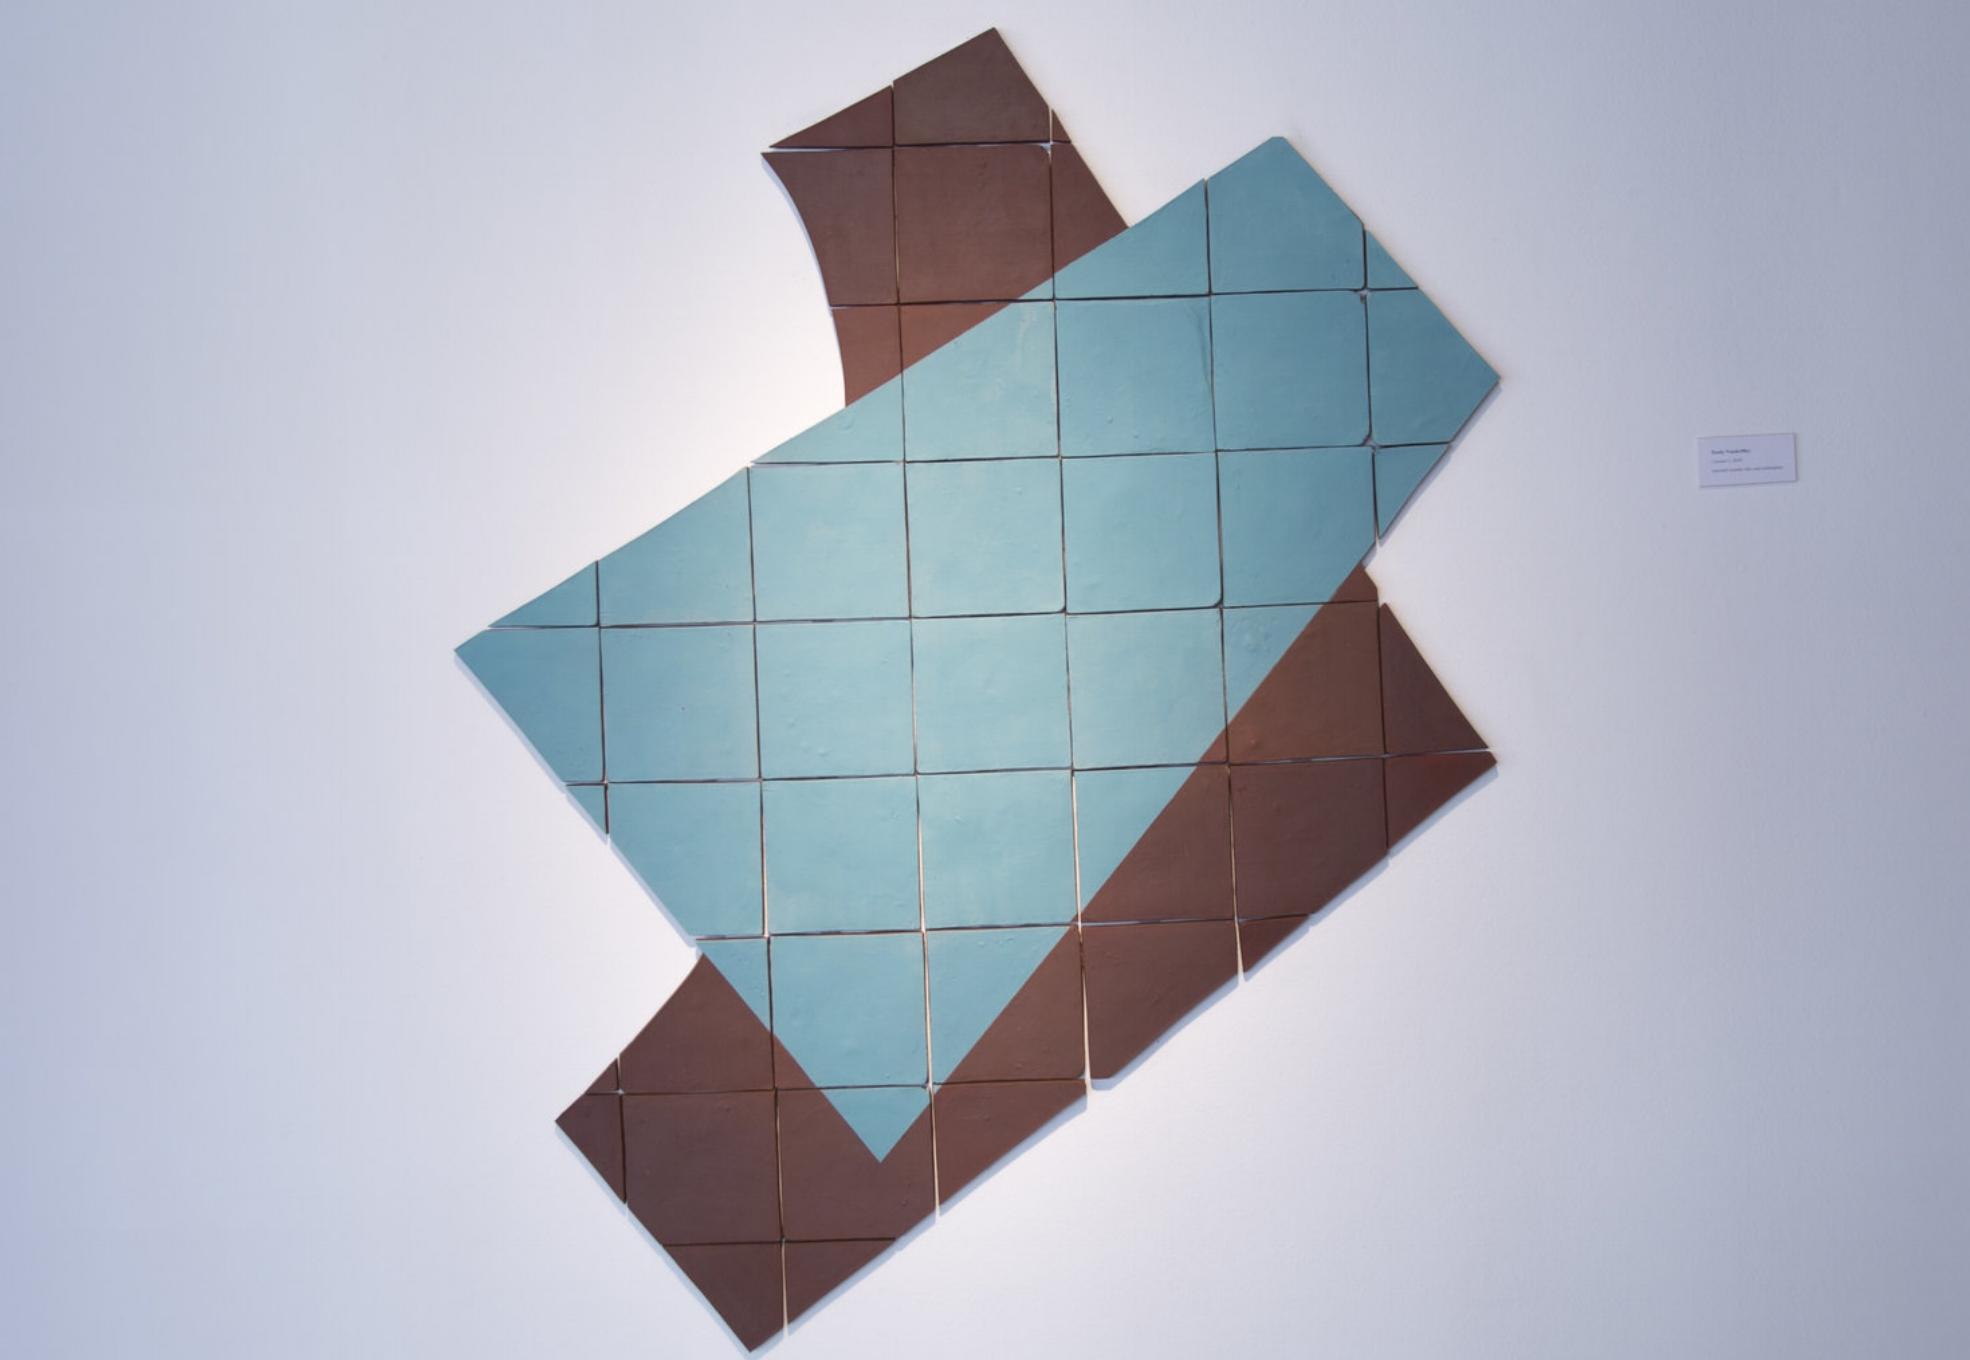 Modern Sculpture Tile Installation Emily VanderMey